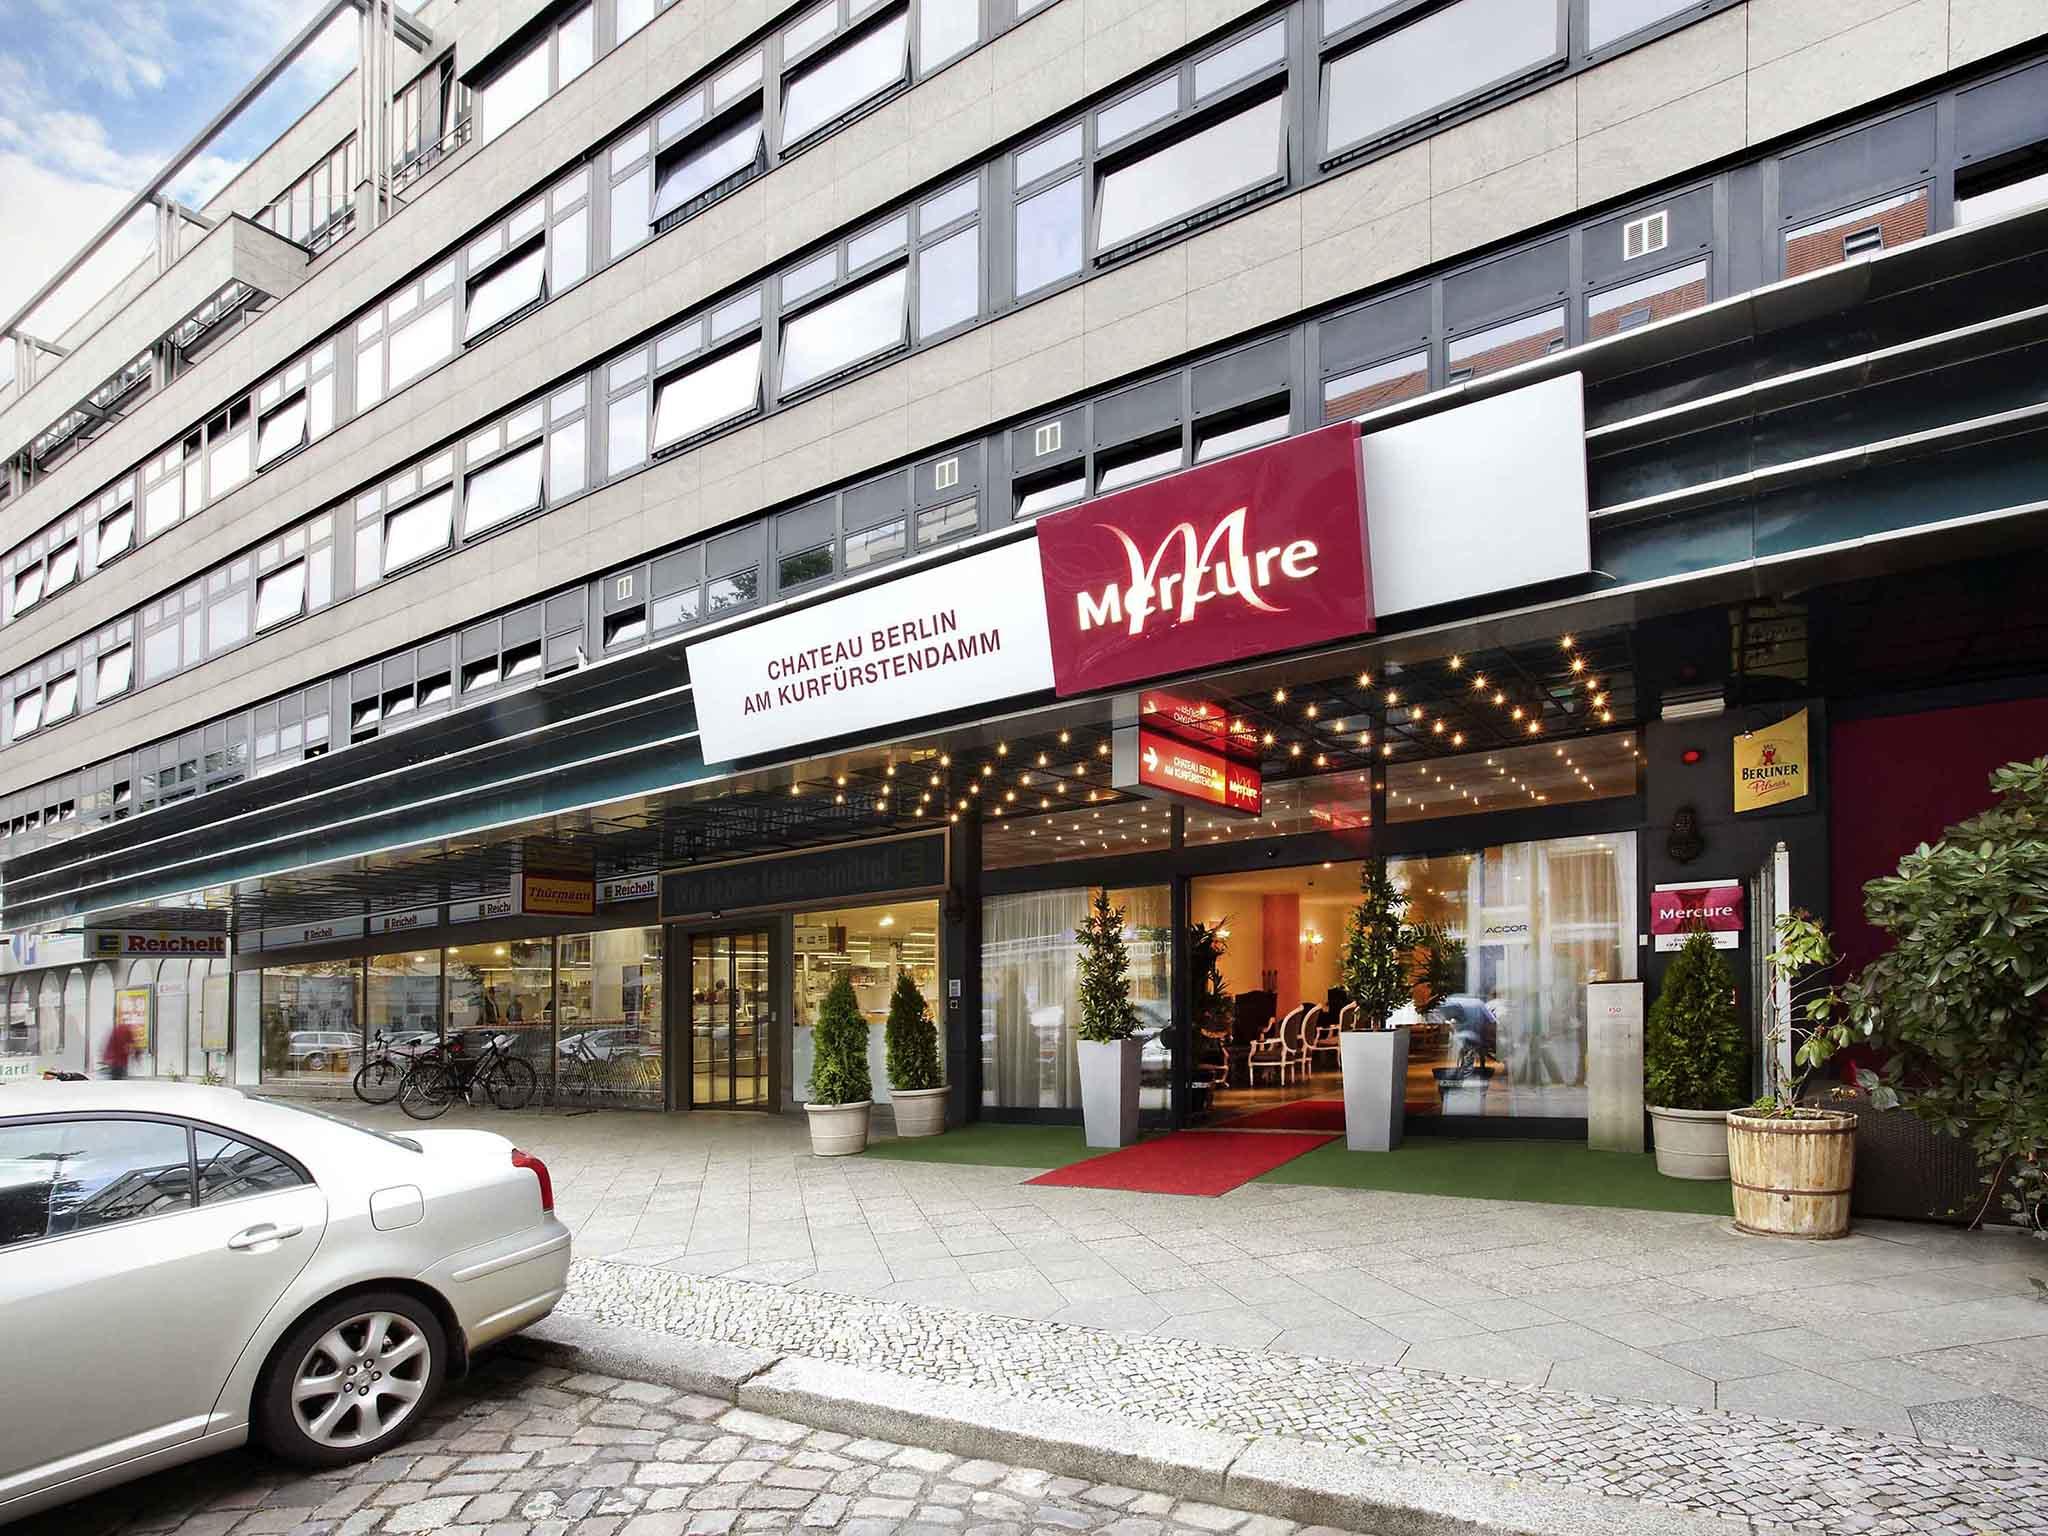 Hotell – Mercure Hotel Chateau Berlin am Kurfuerstendamm